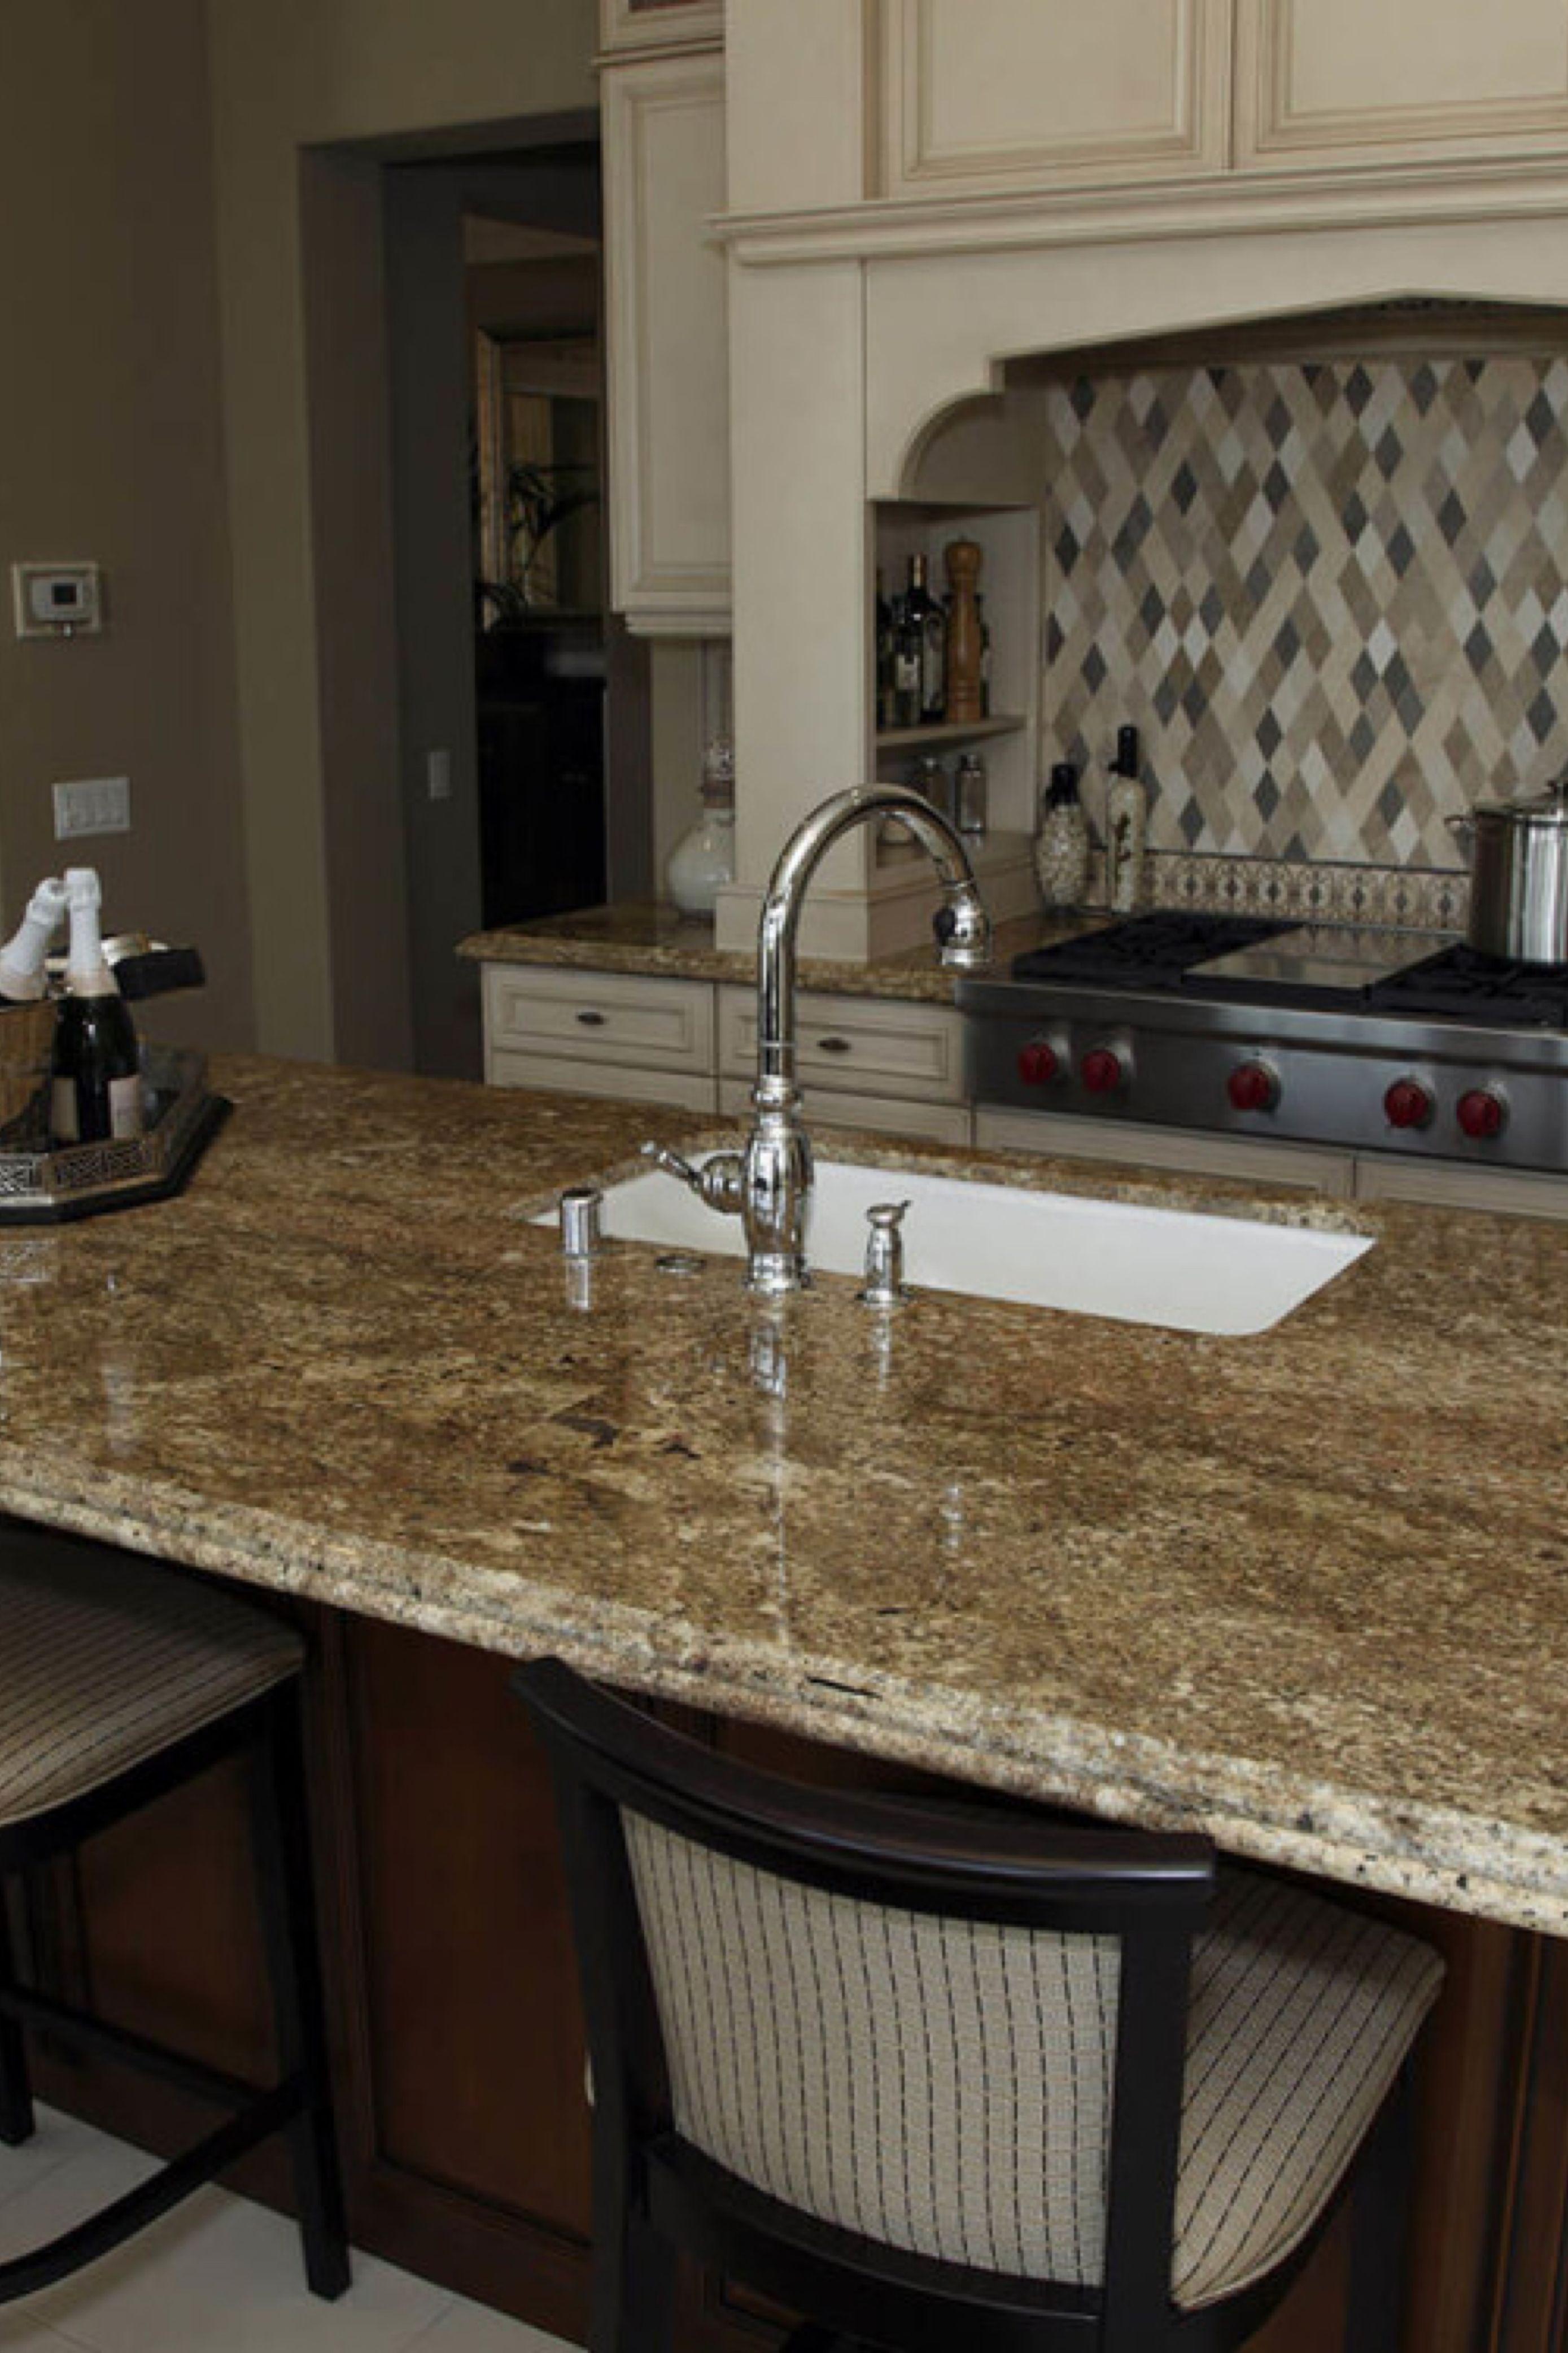 Bengali Granite In 2020 Gourmet Kitchen Design Kitchen Design Granite Countertops Kitchen Design Pictures